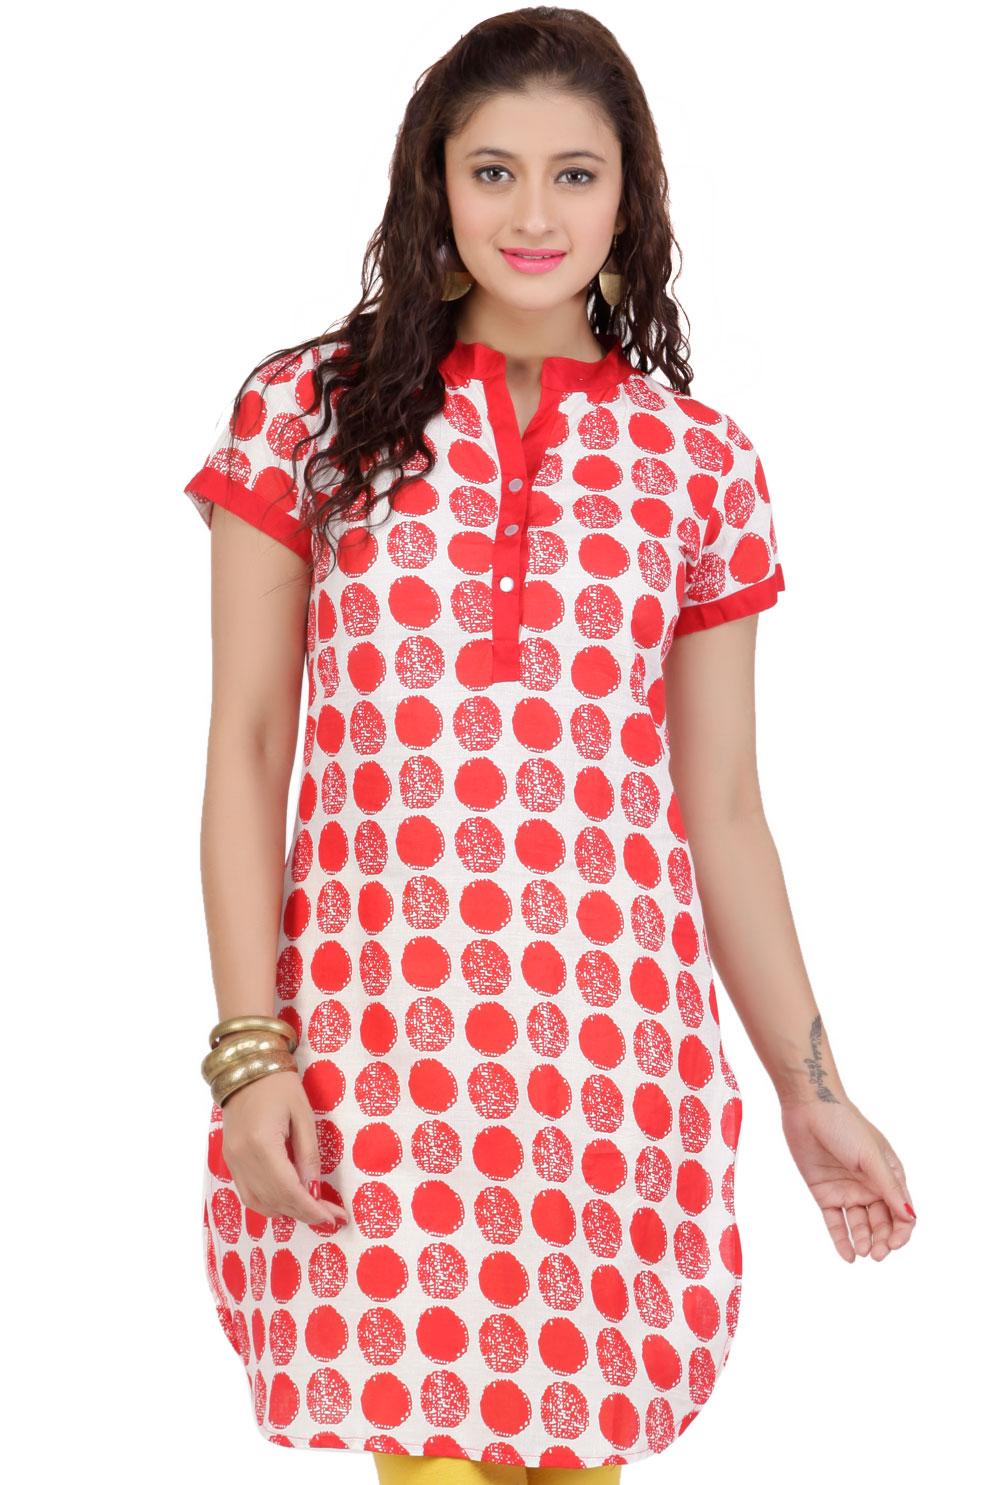 Shirt ke design - Latest Women Cotton Shirts And Kurti Designs For Spring Summer 10